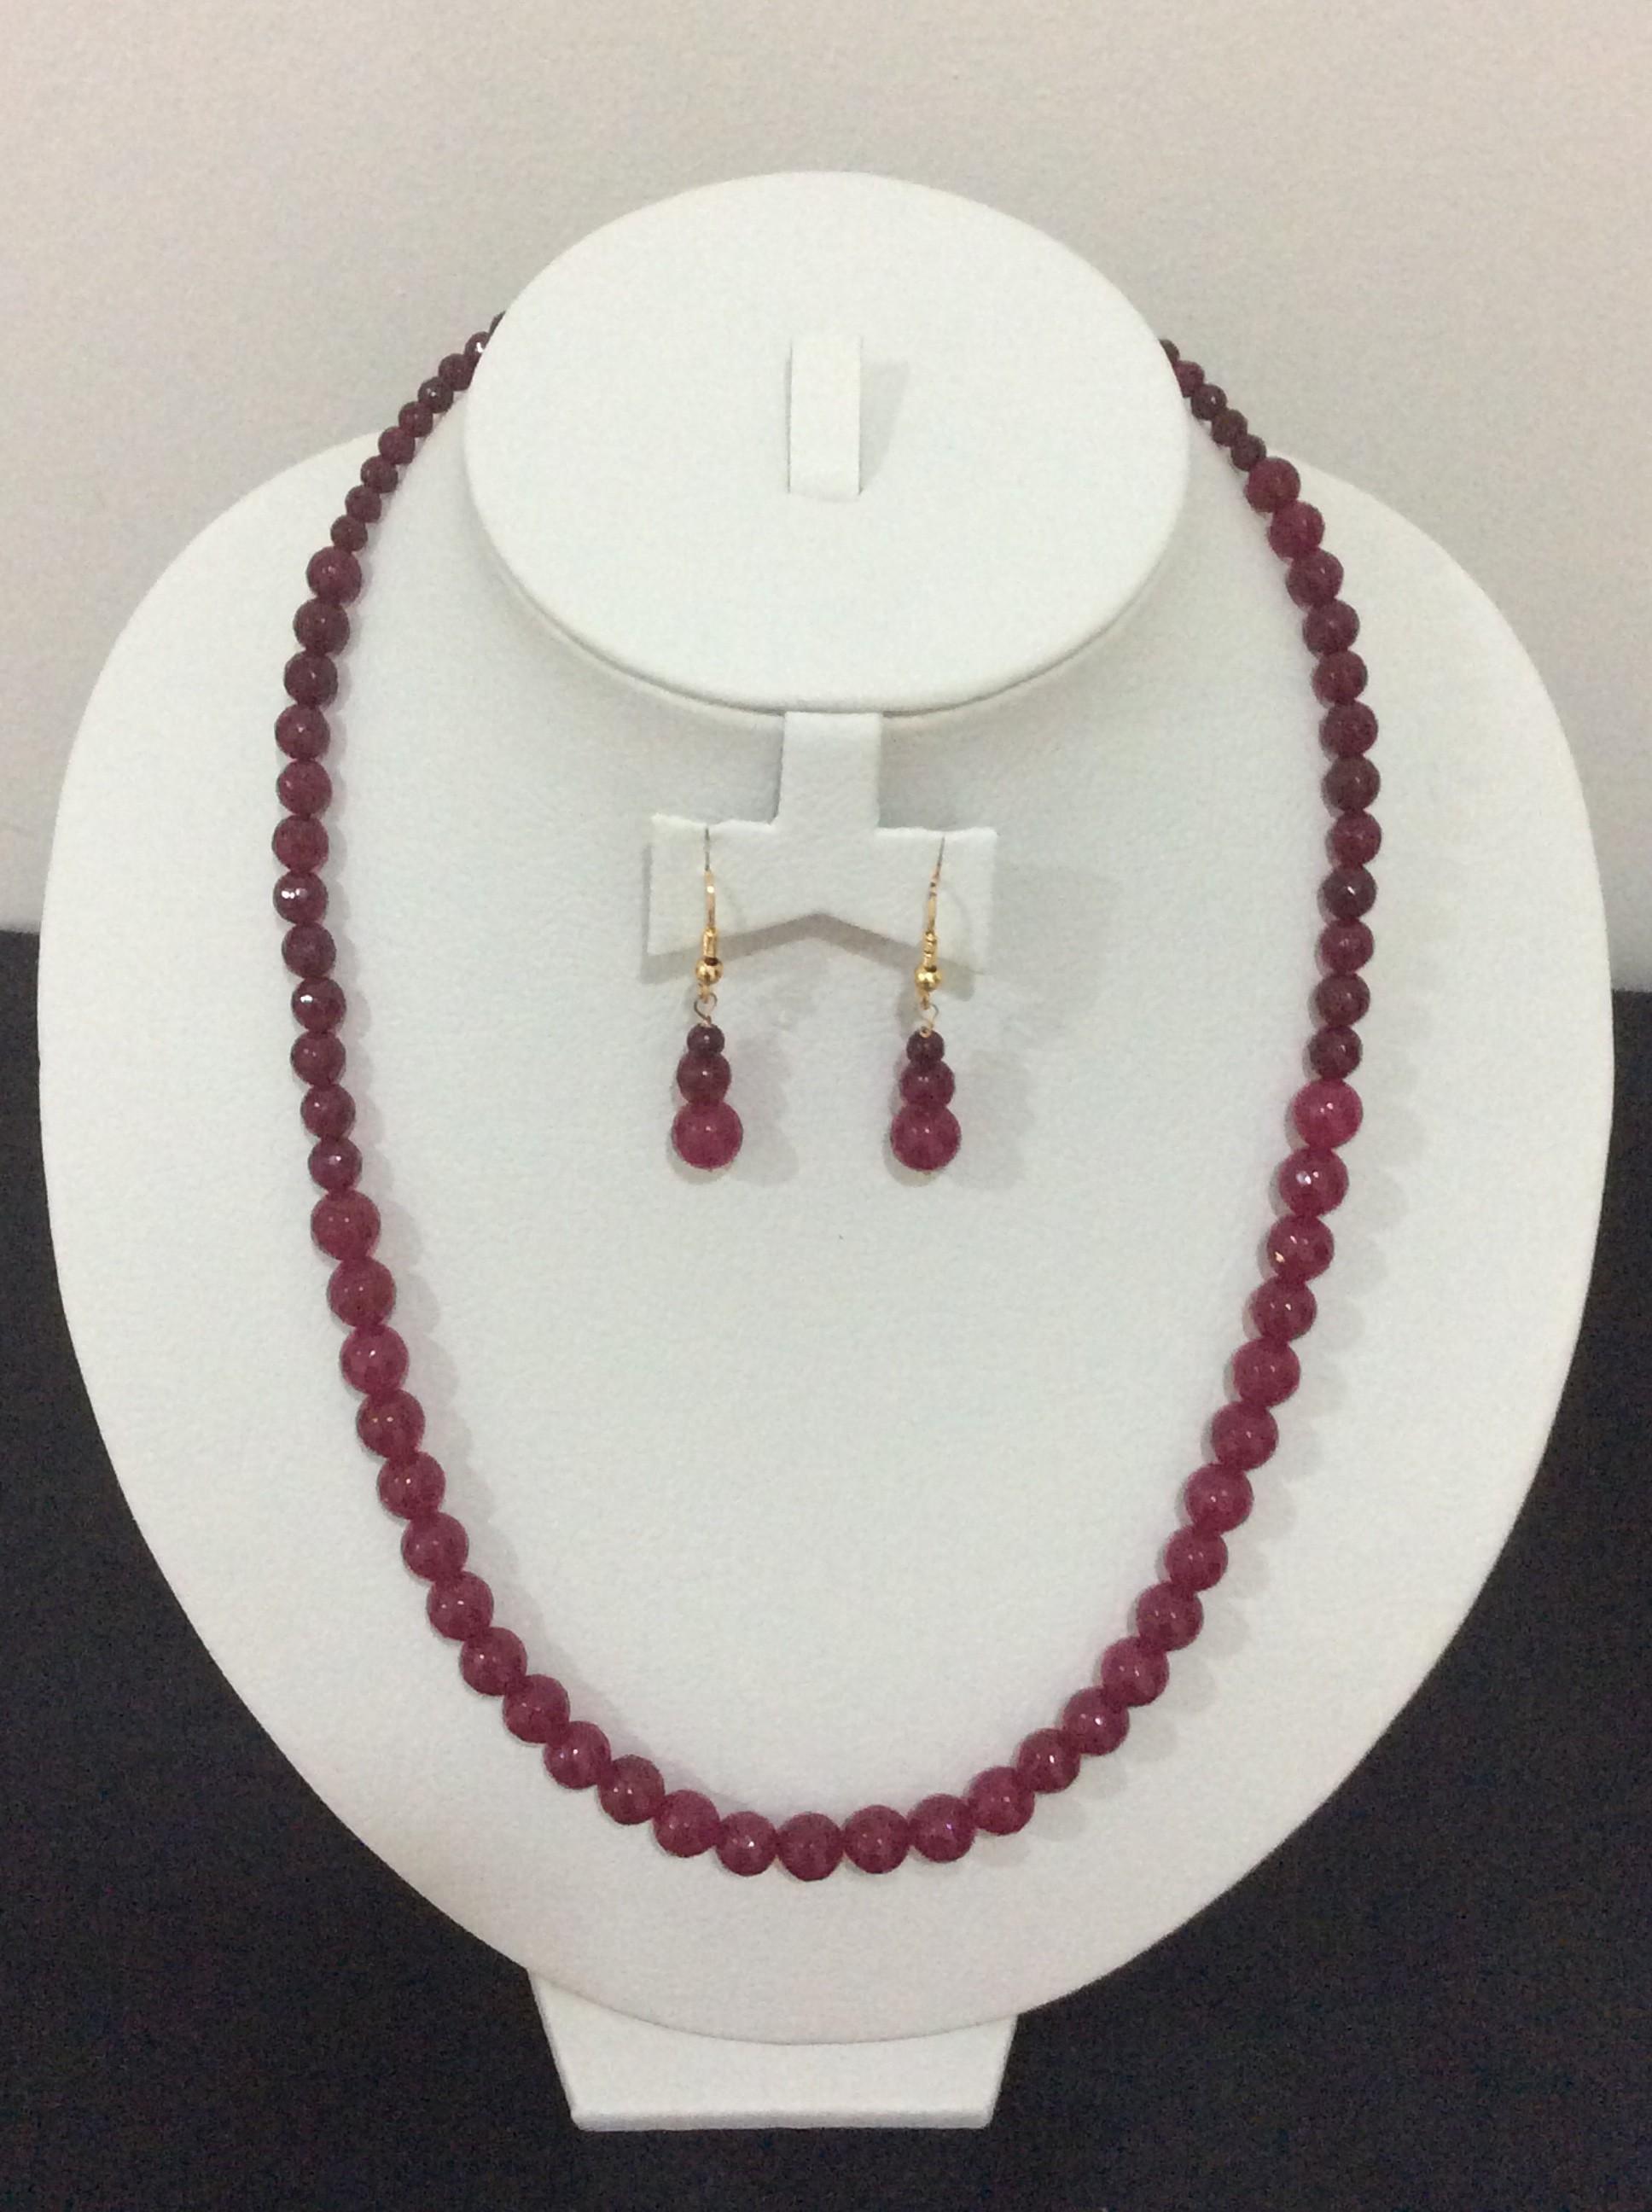 Brand-new Handmade Semi-Precious Bead Fashion Jewelry-03 | Tulasi Trendz CR34